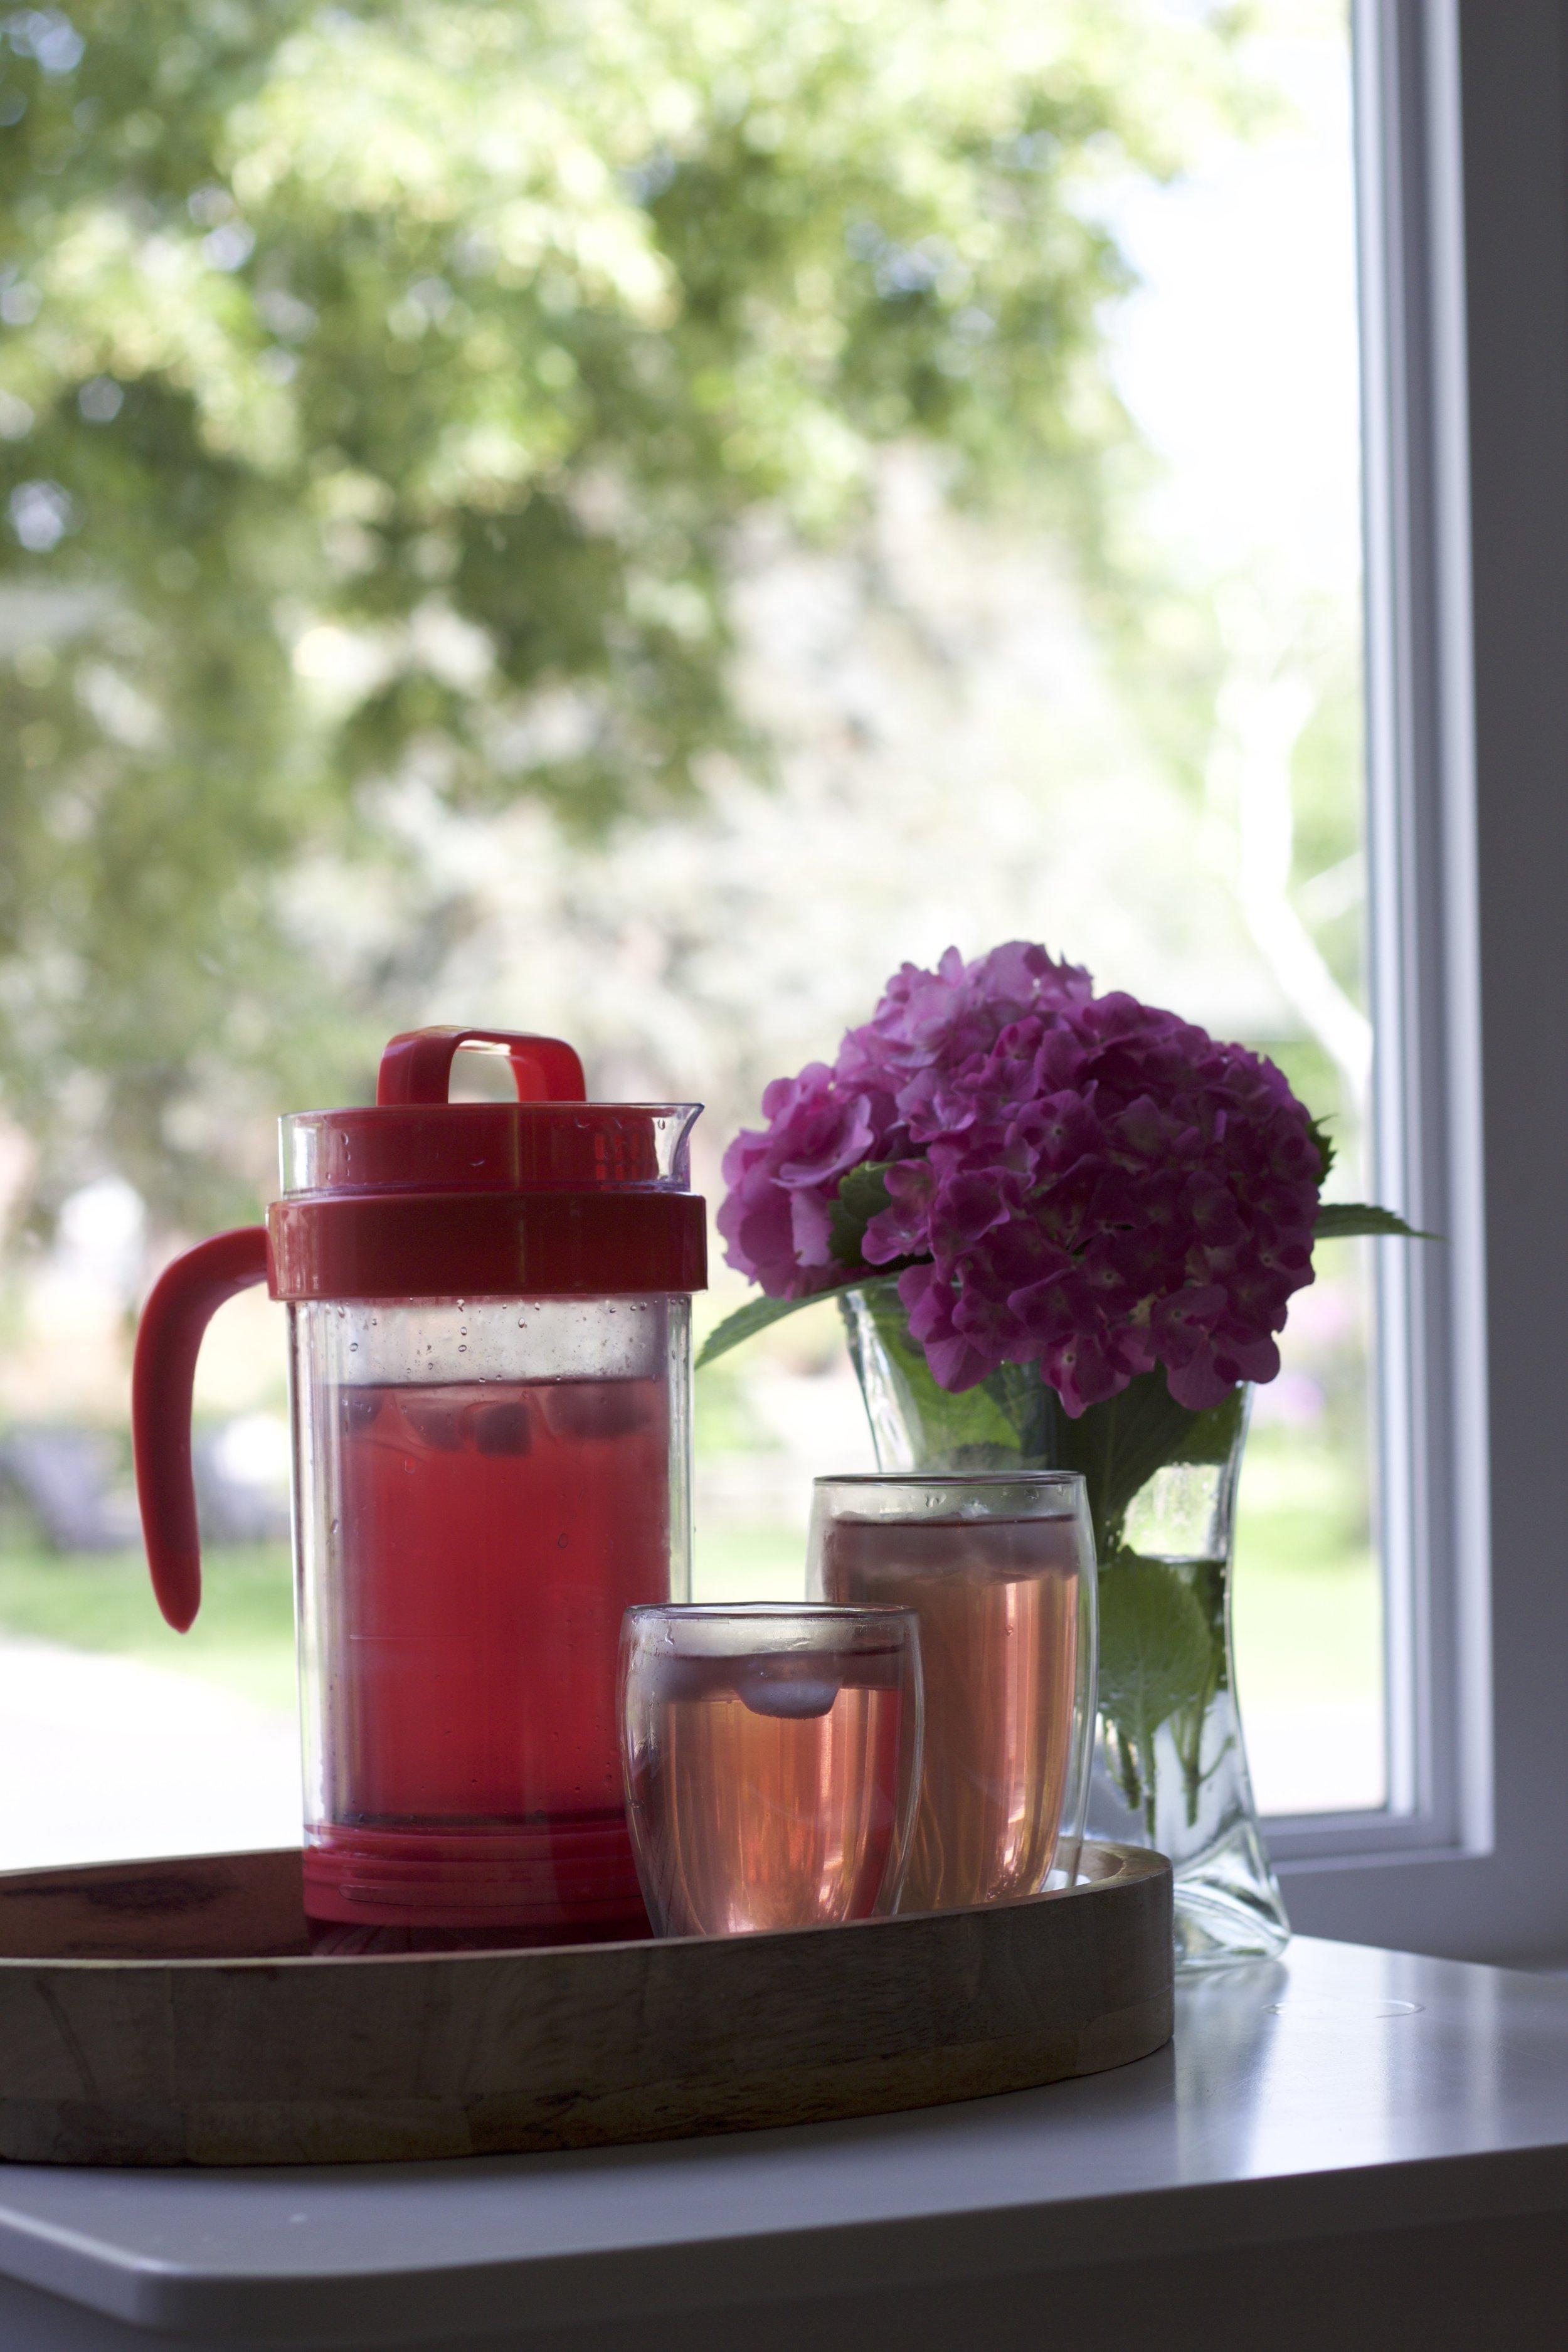 Iced Herbal Tea